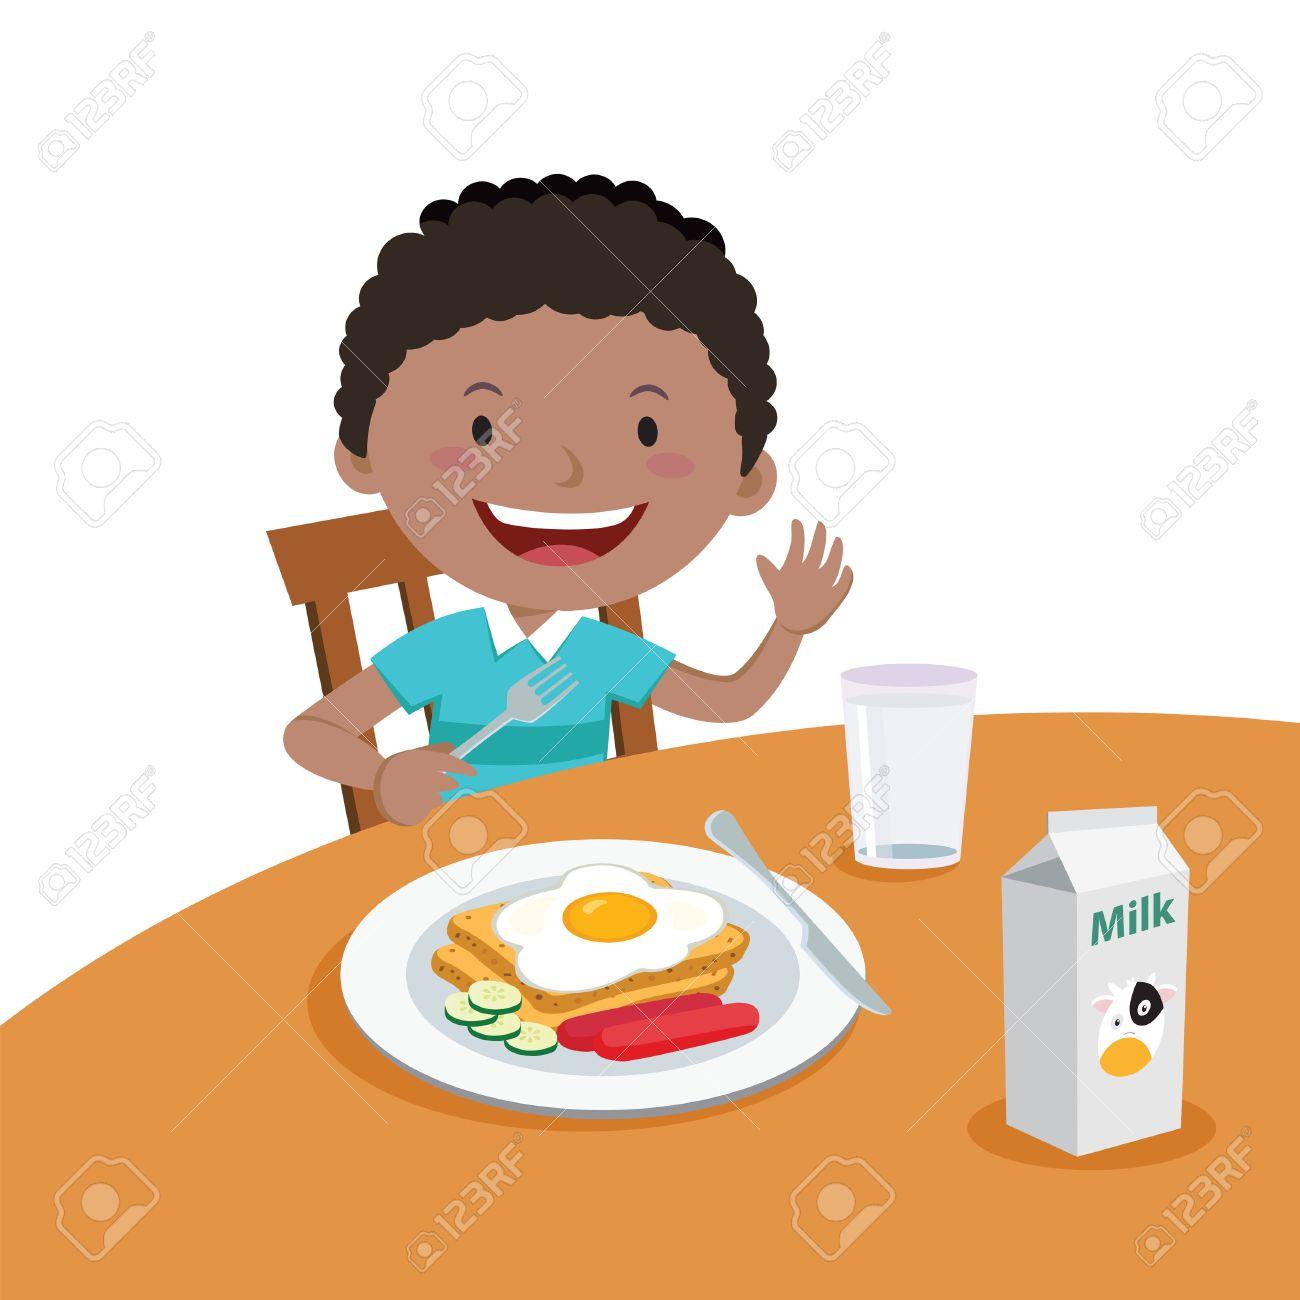 Clipart Boy Eating Breakfast.